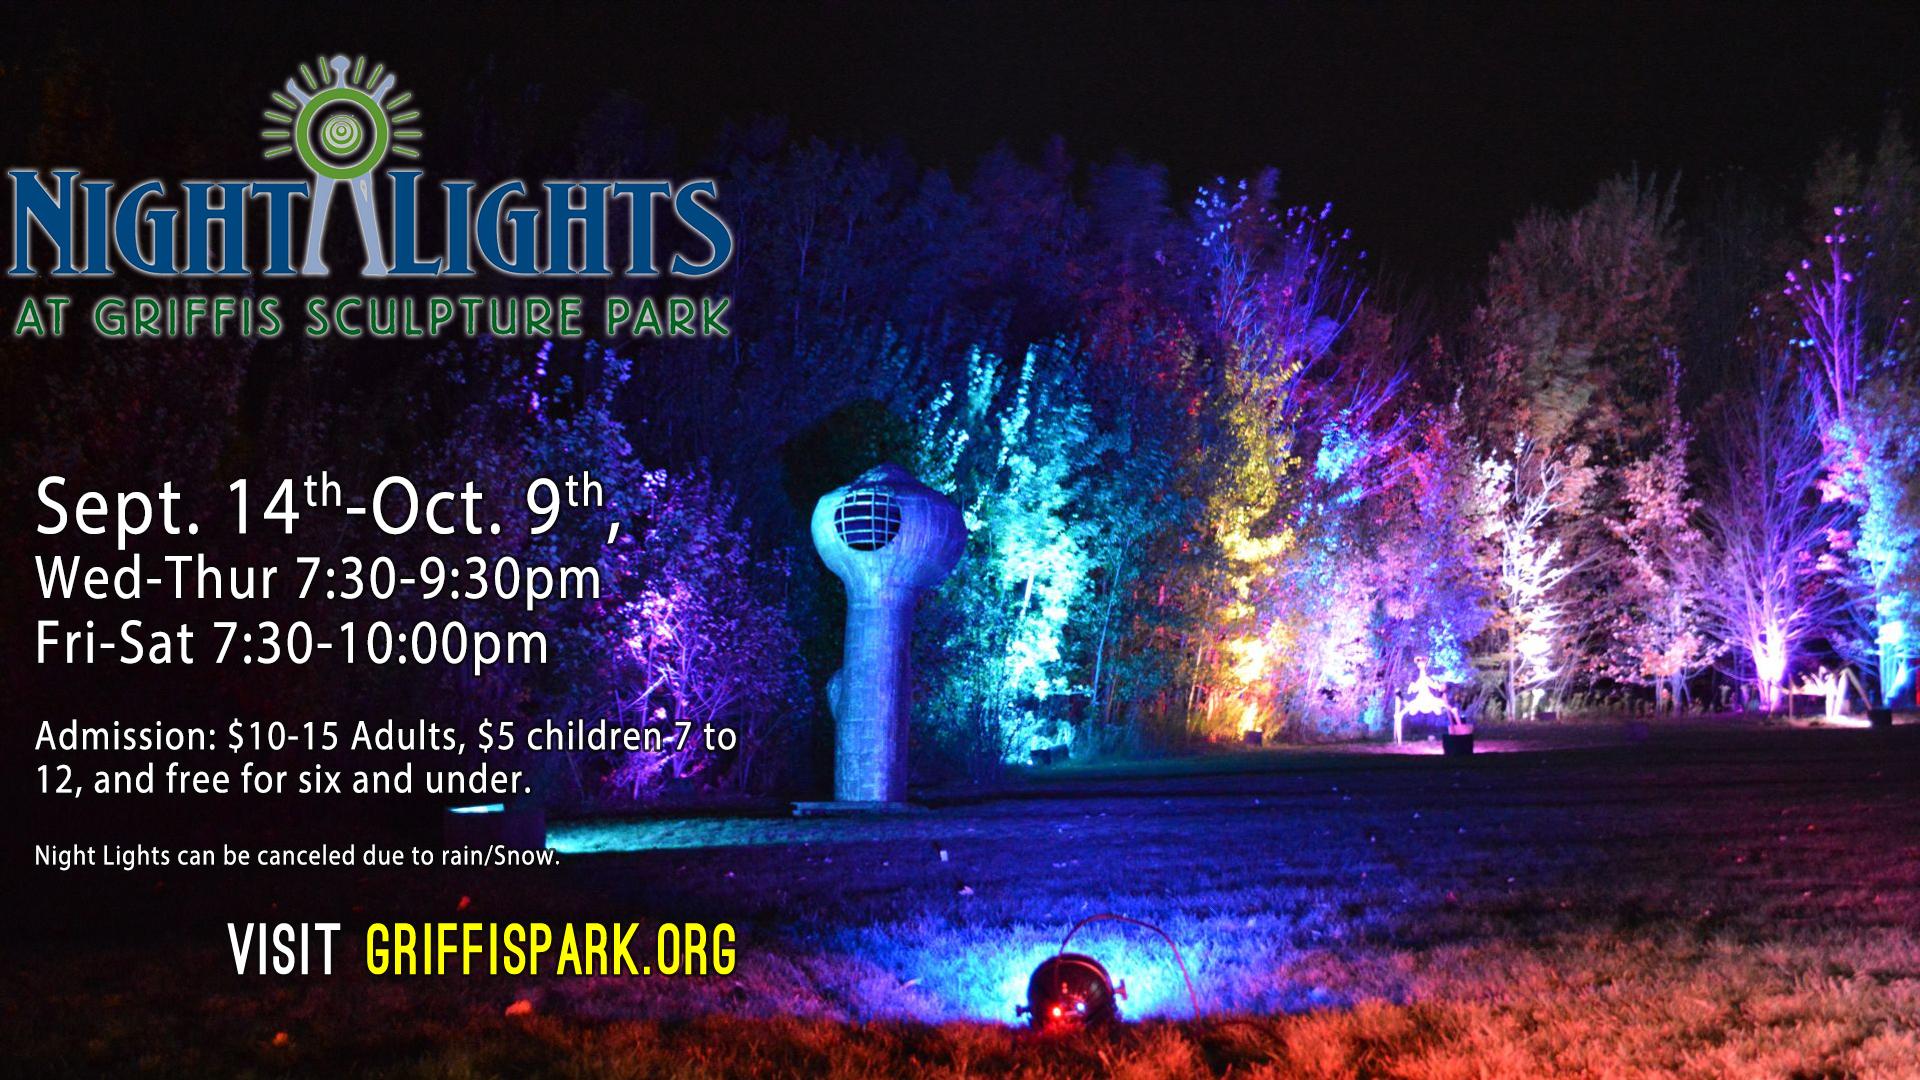 Night Lights returns to Griffis Sculpture Park